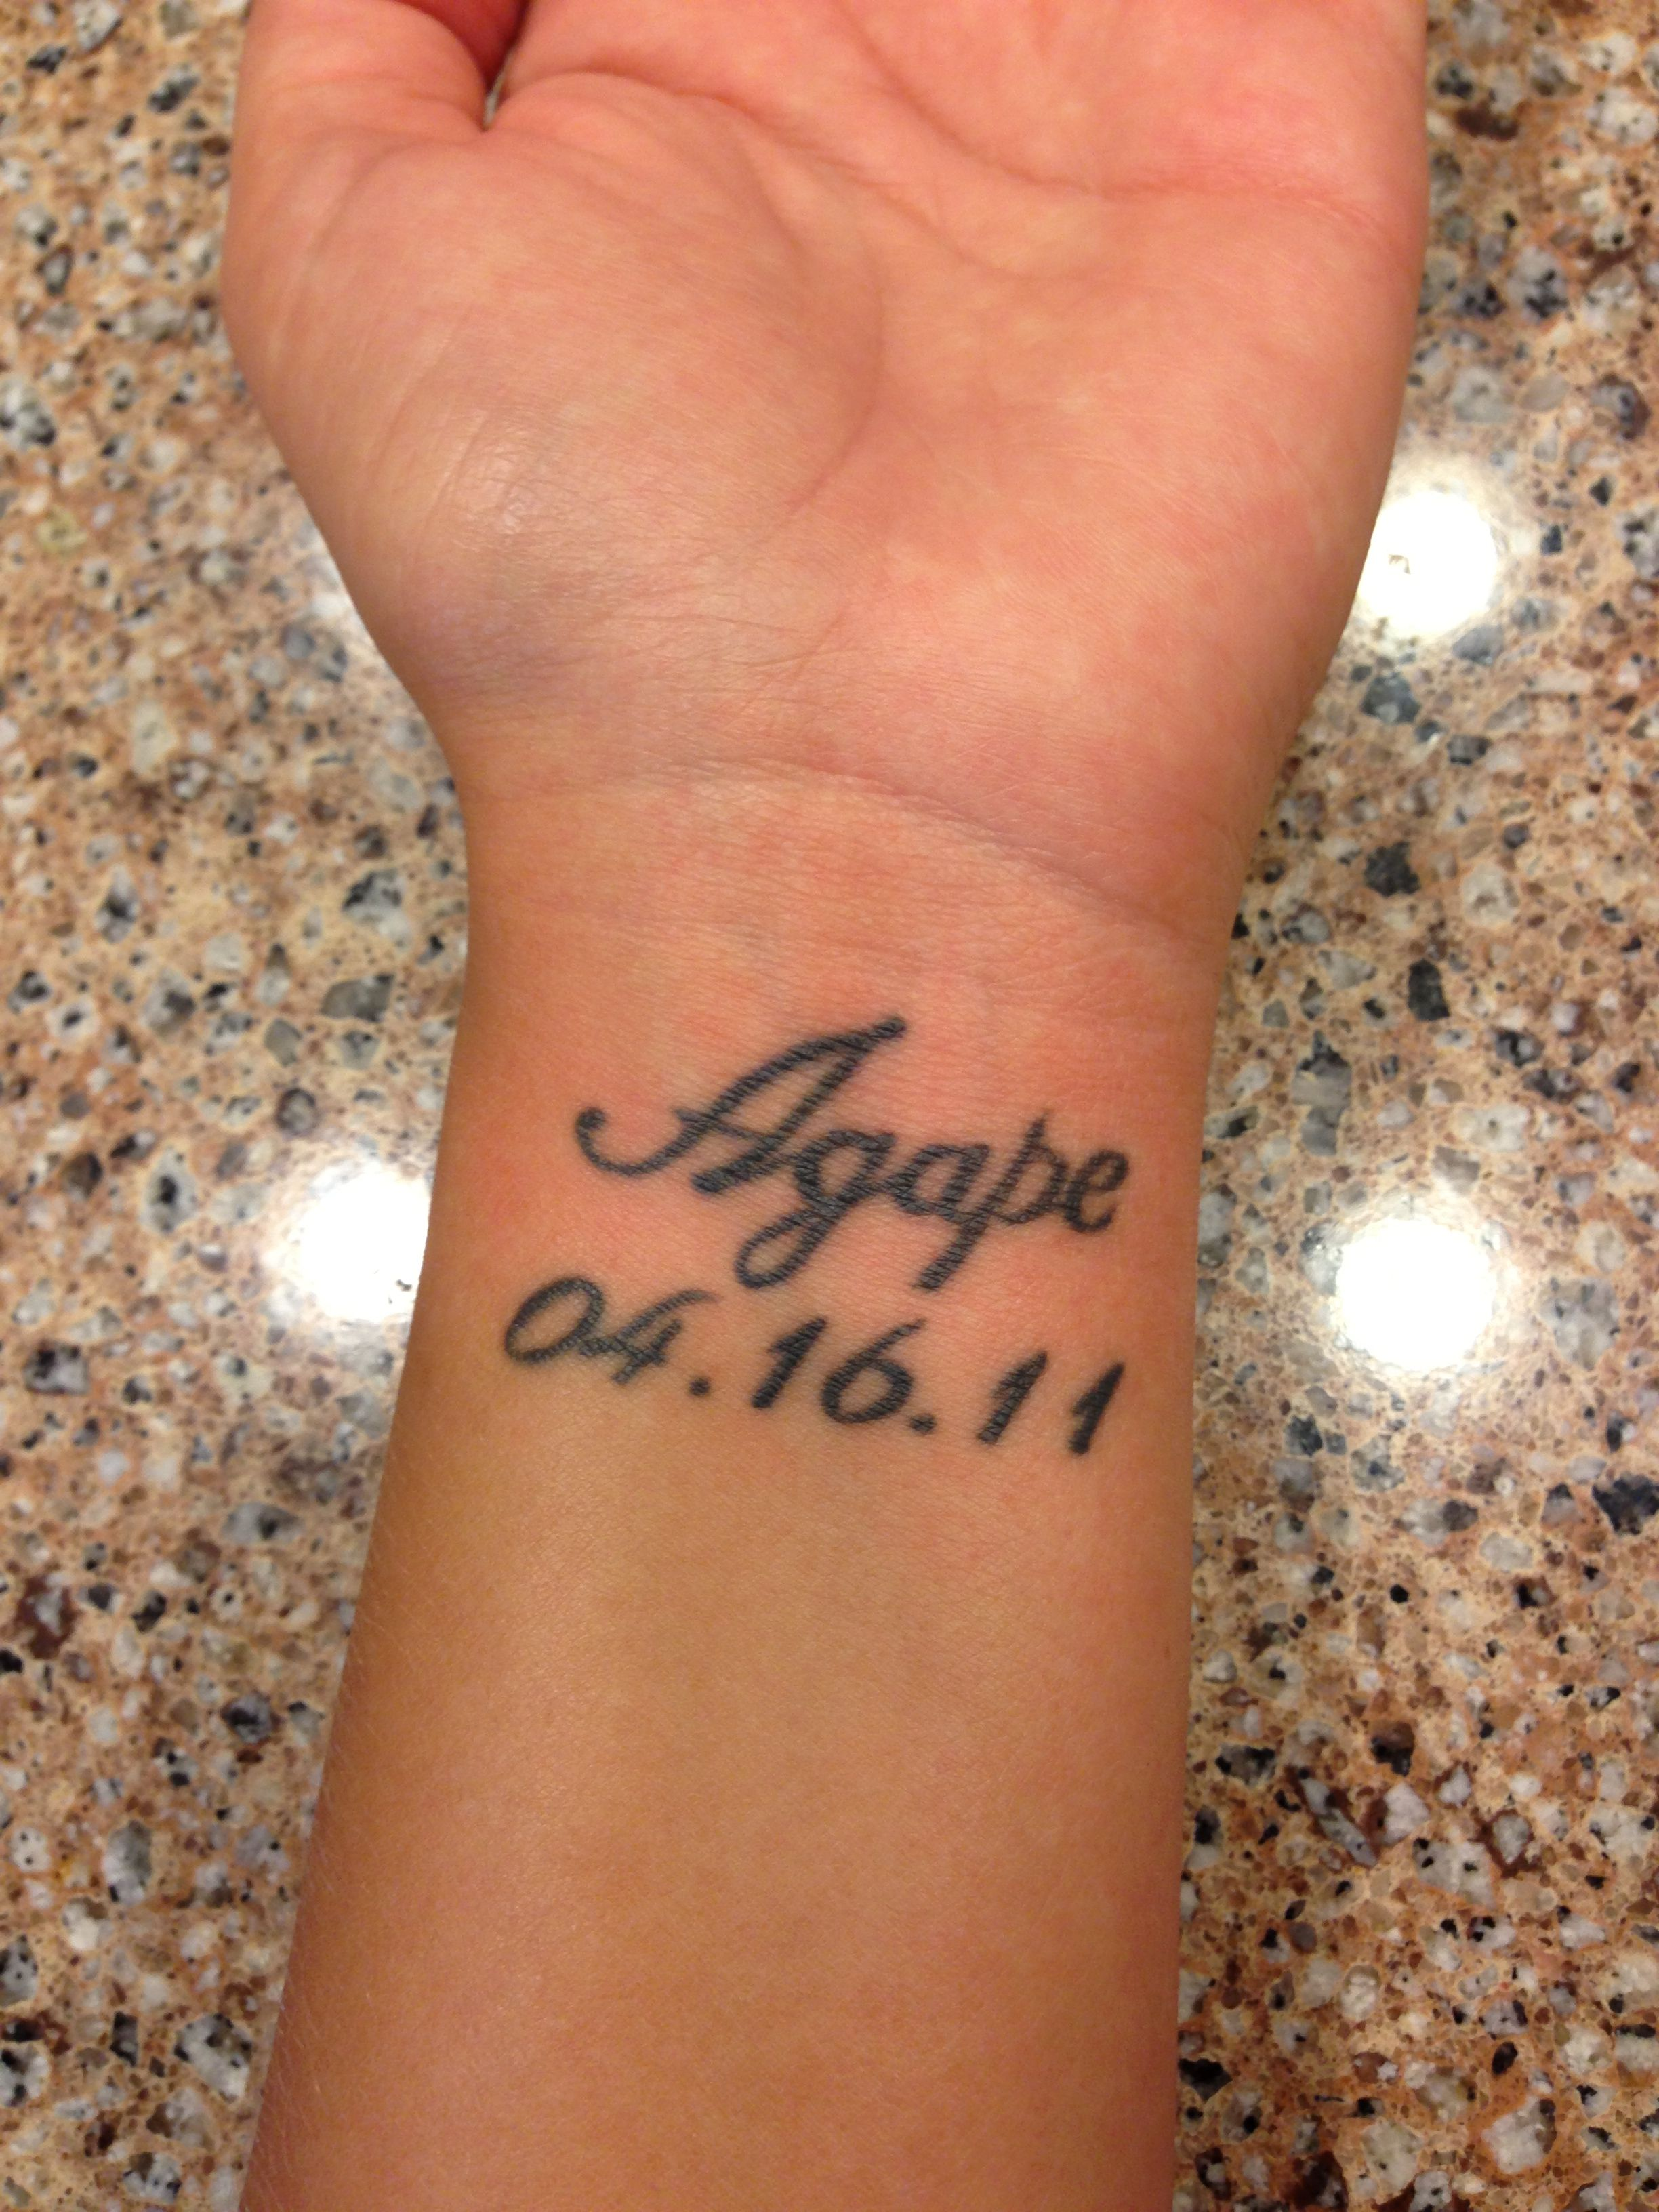 Meaningful Wedding Wrist Tattoo Tattoo designs for women